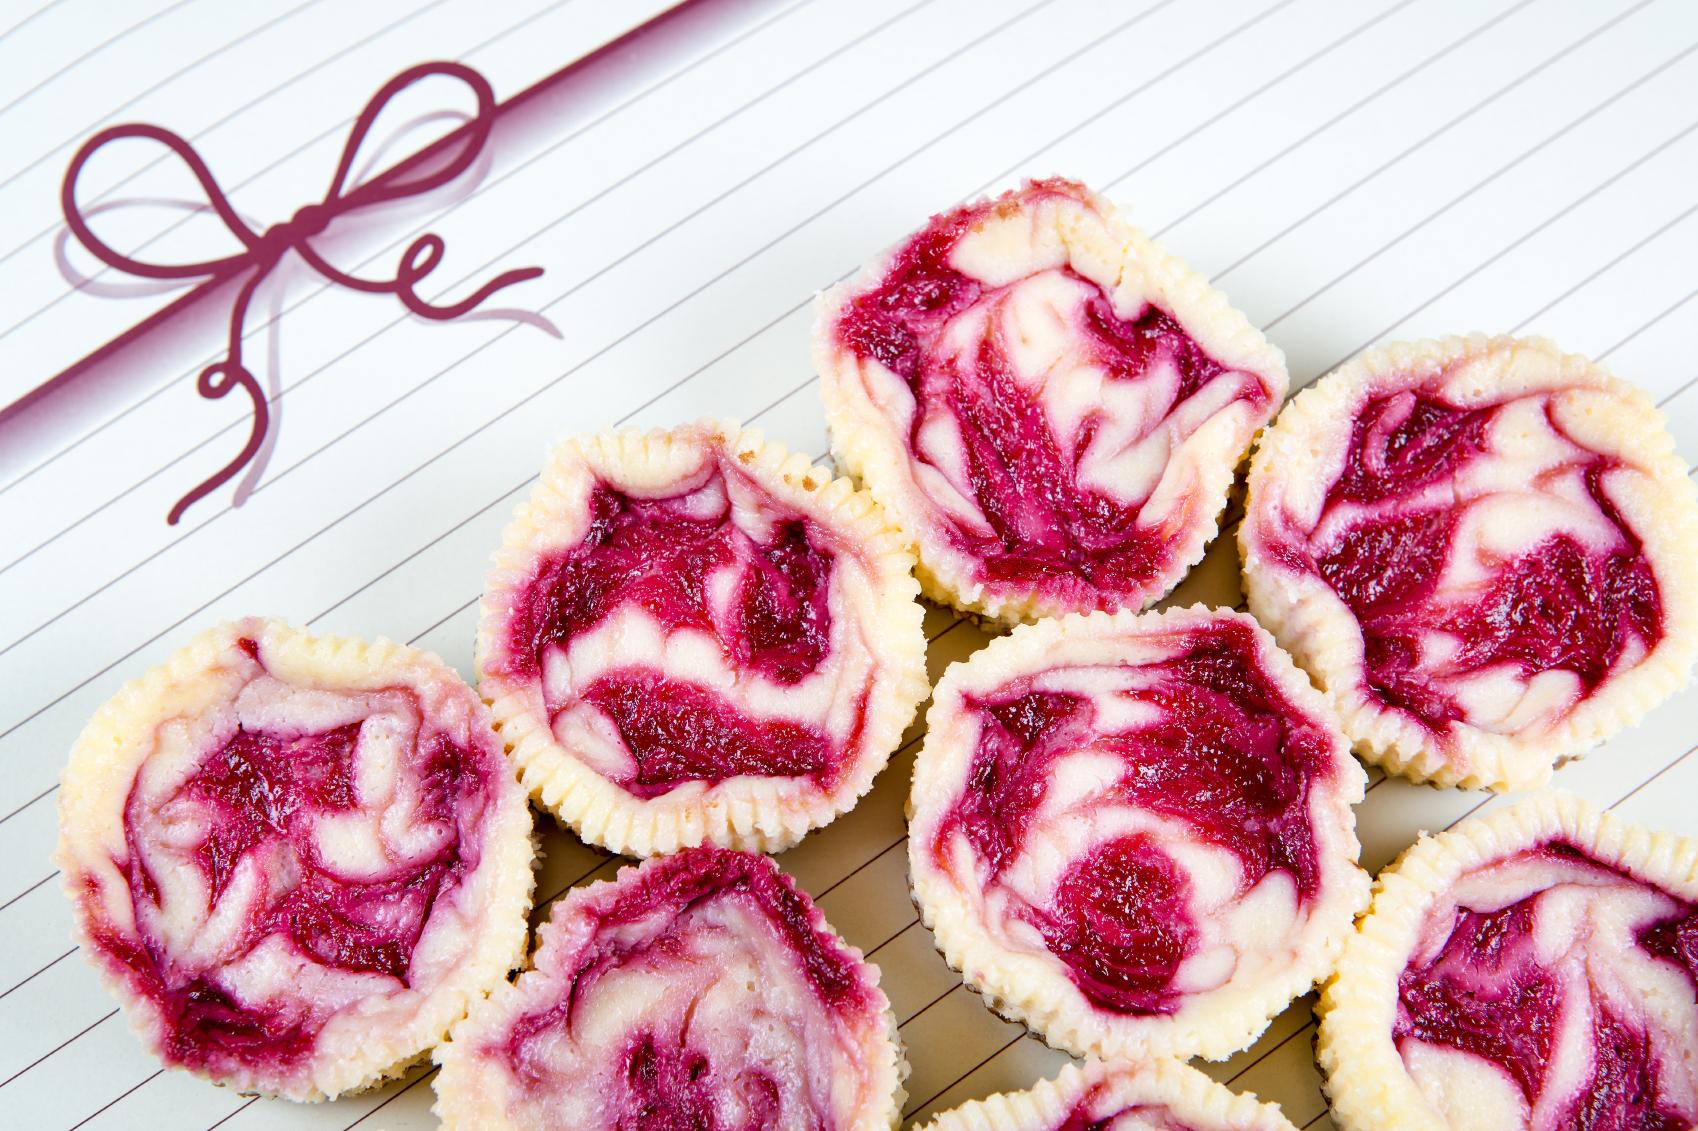 Mini cheesecakes with mascarpone and fruit: Cheesecakes żgħar bil-mascarpone u l-frott